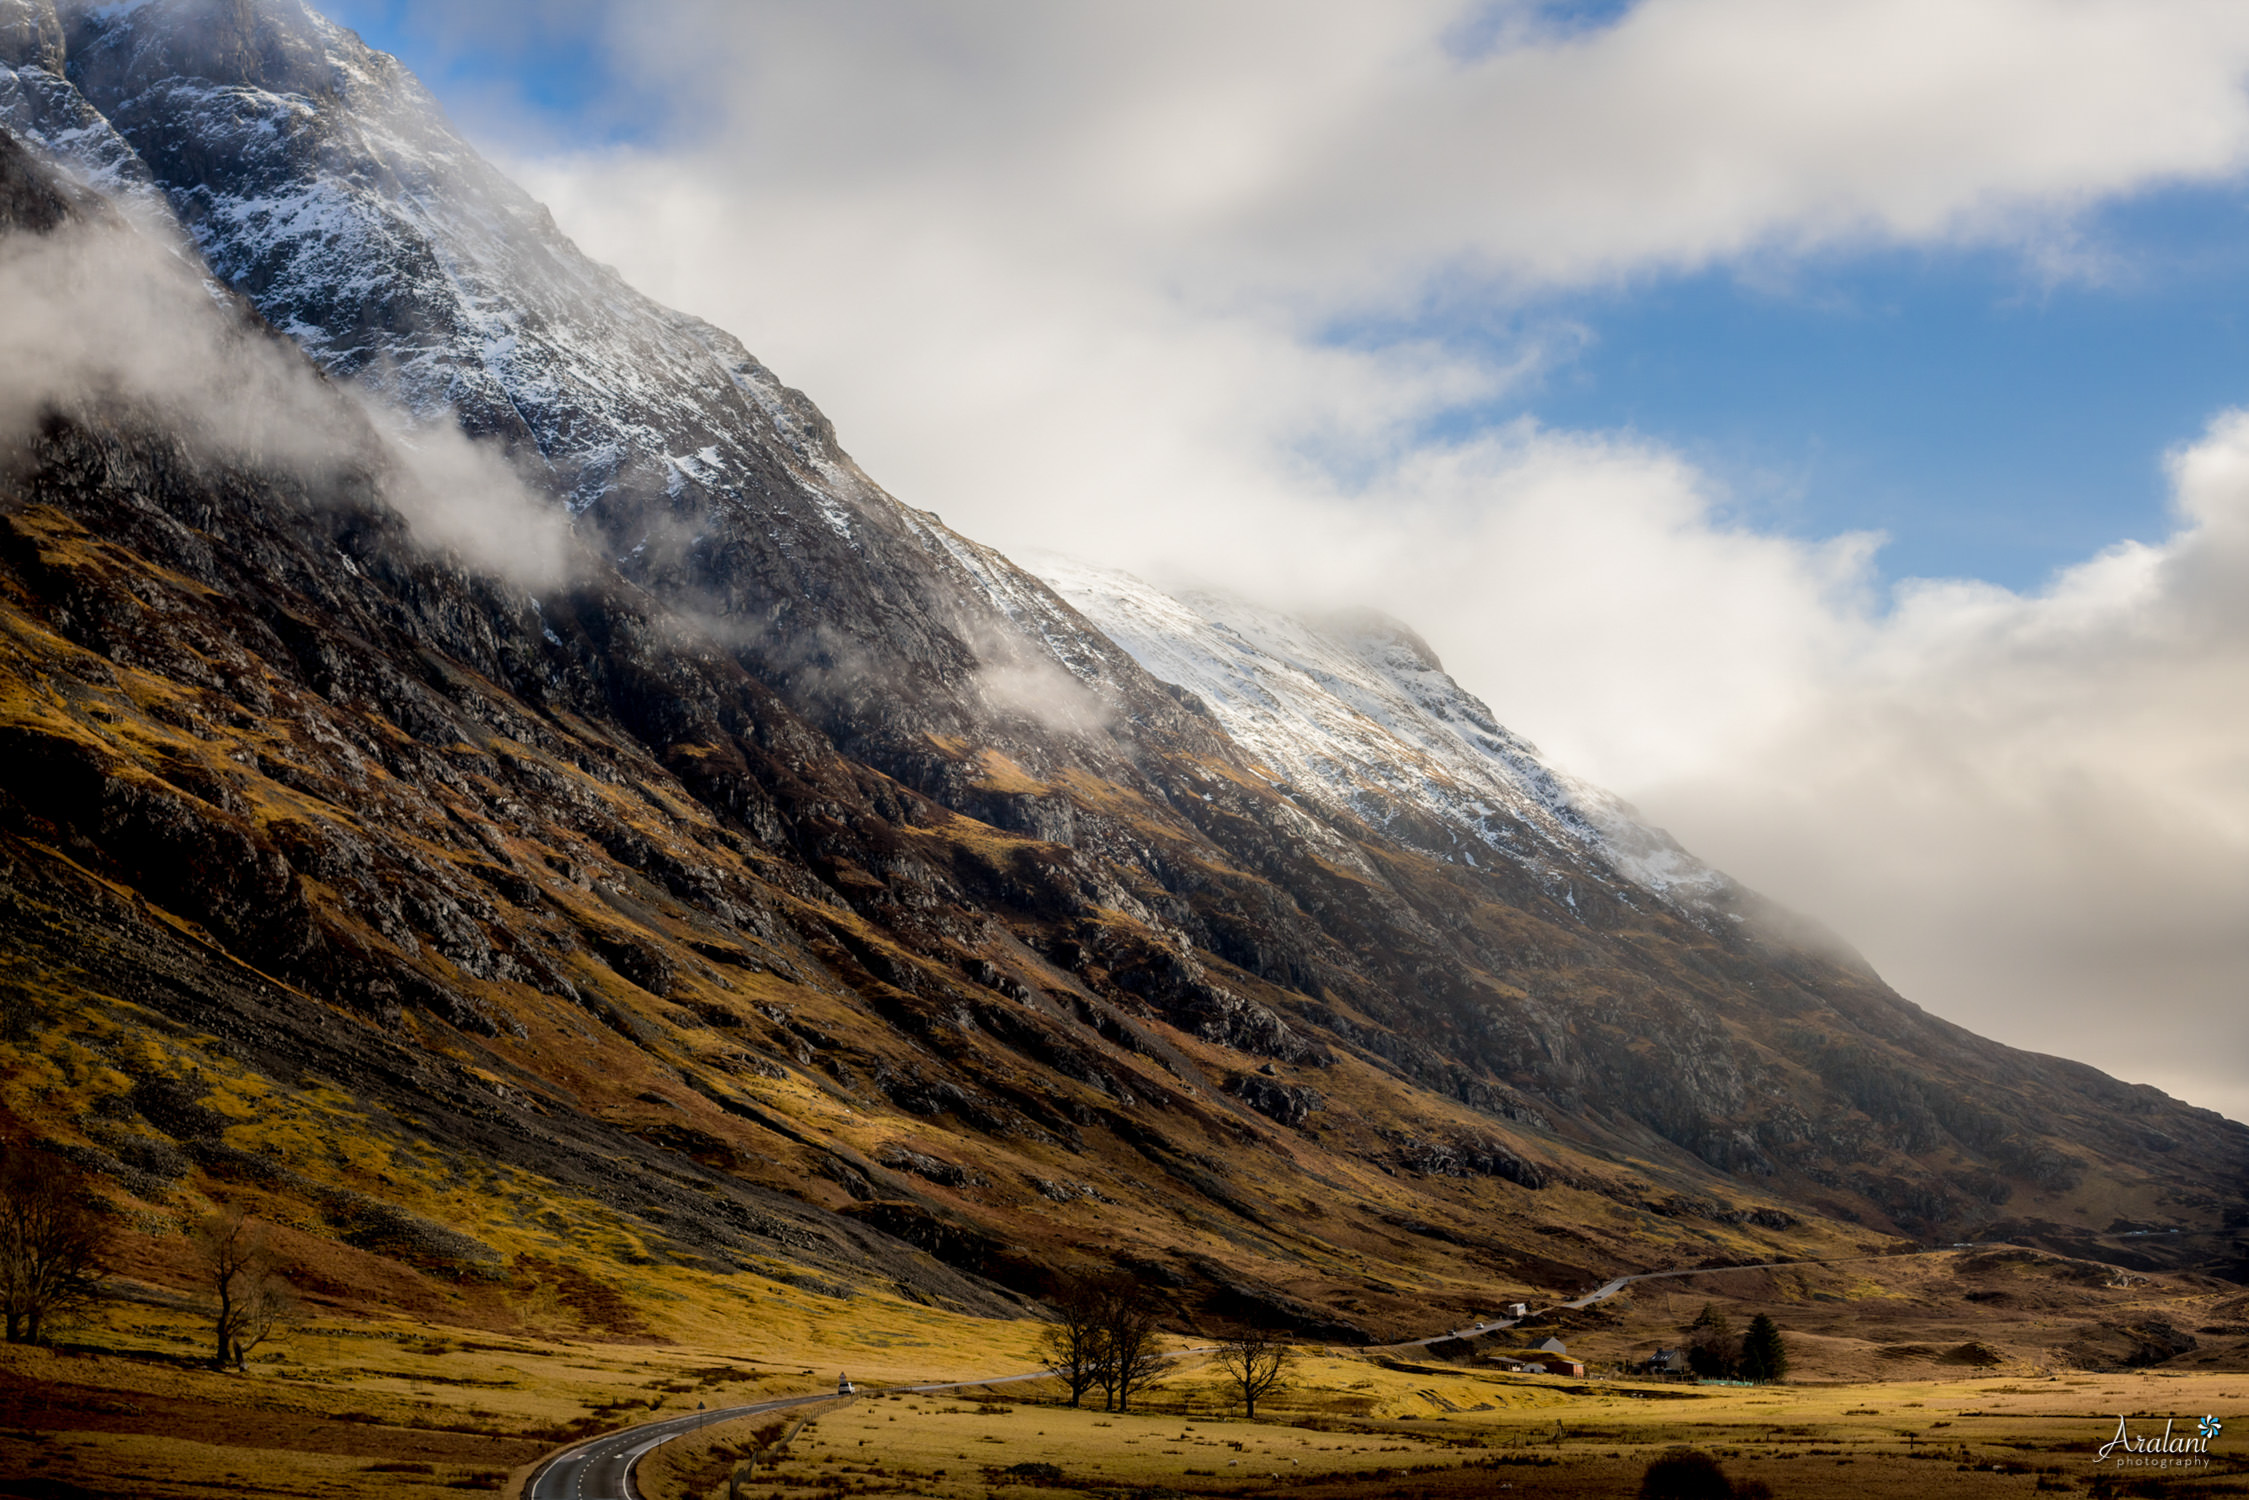 Aralani_Scotland_0002.jpg